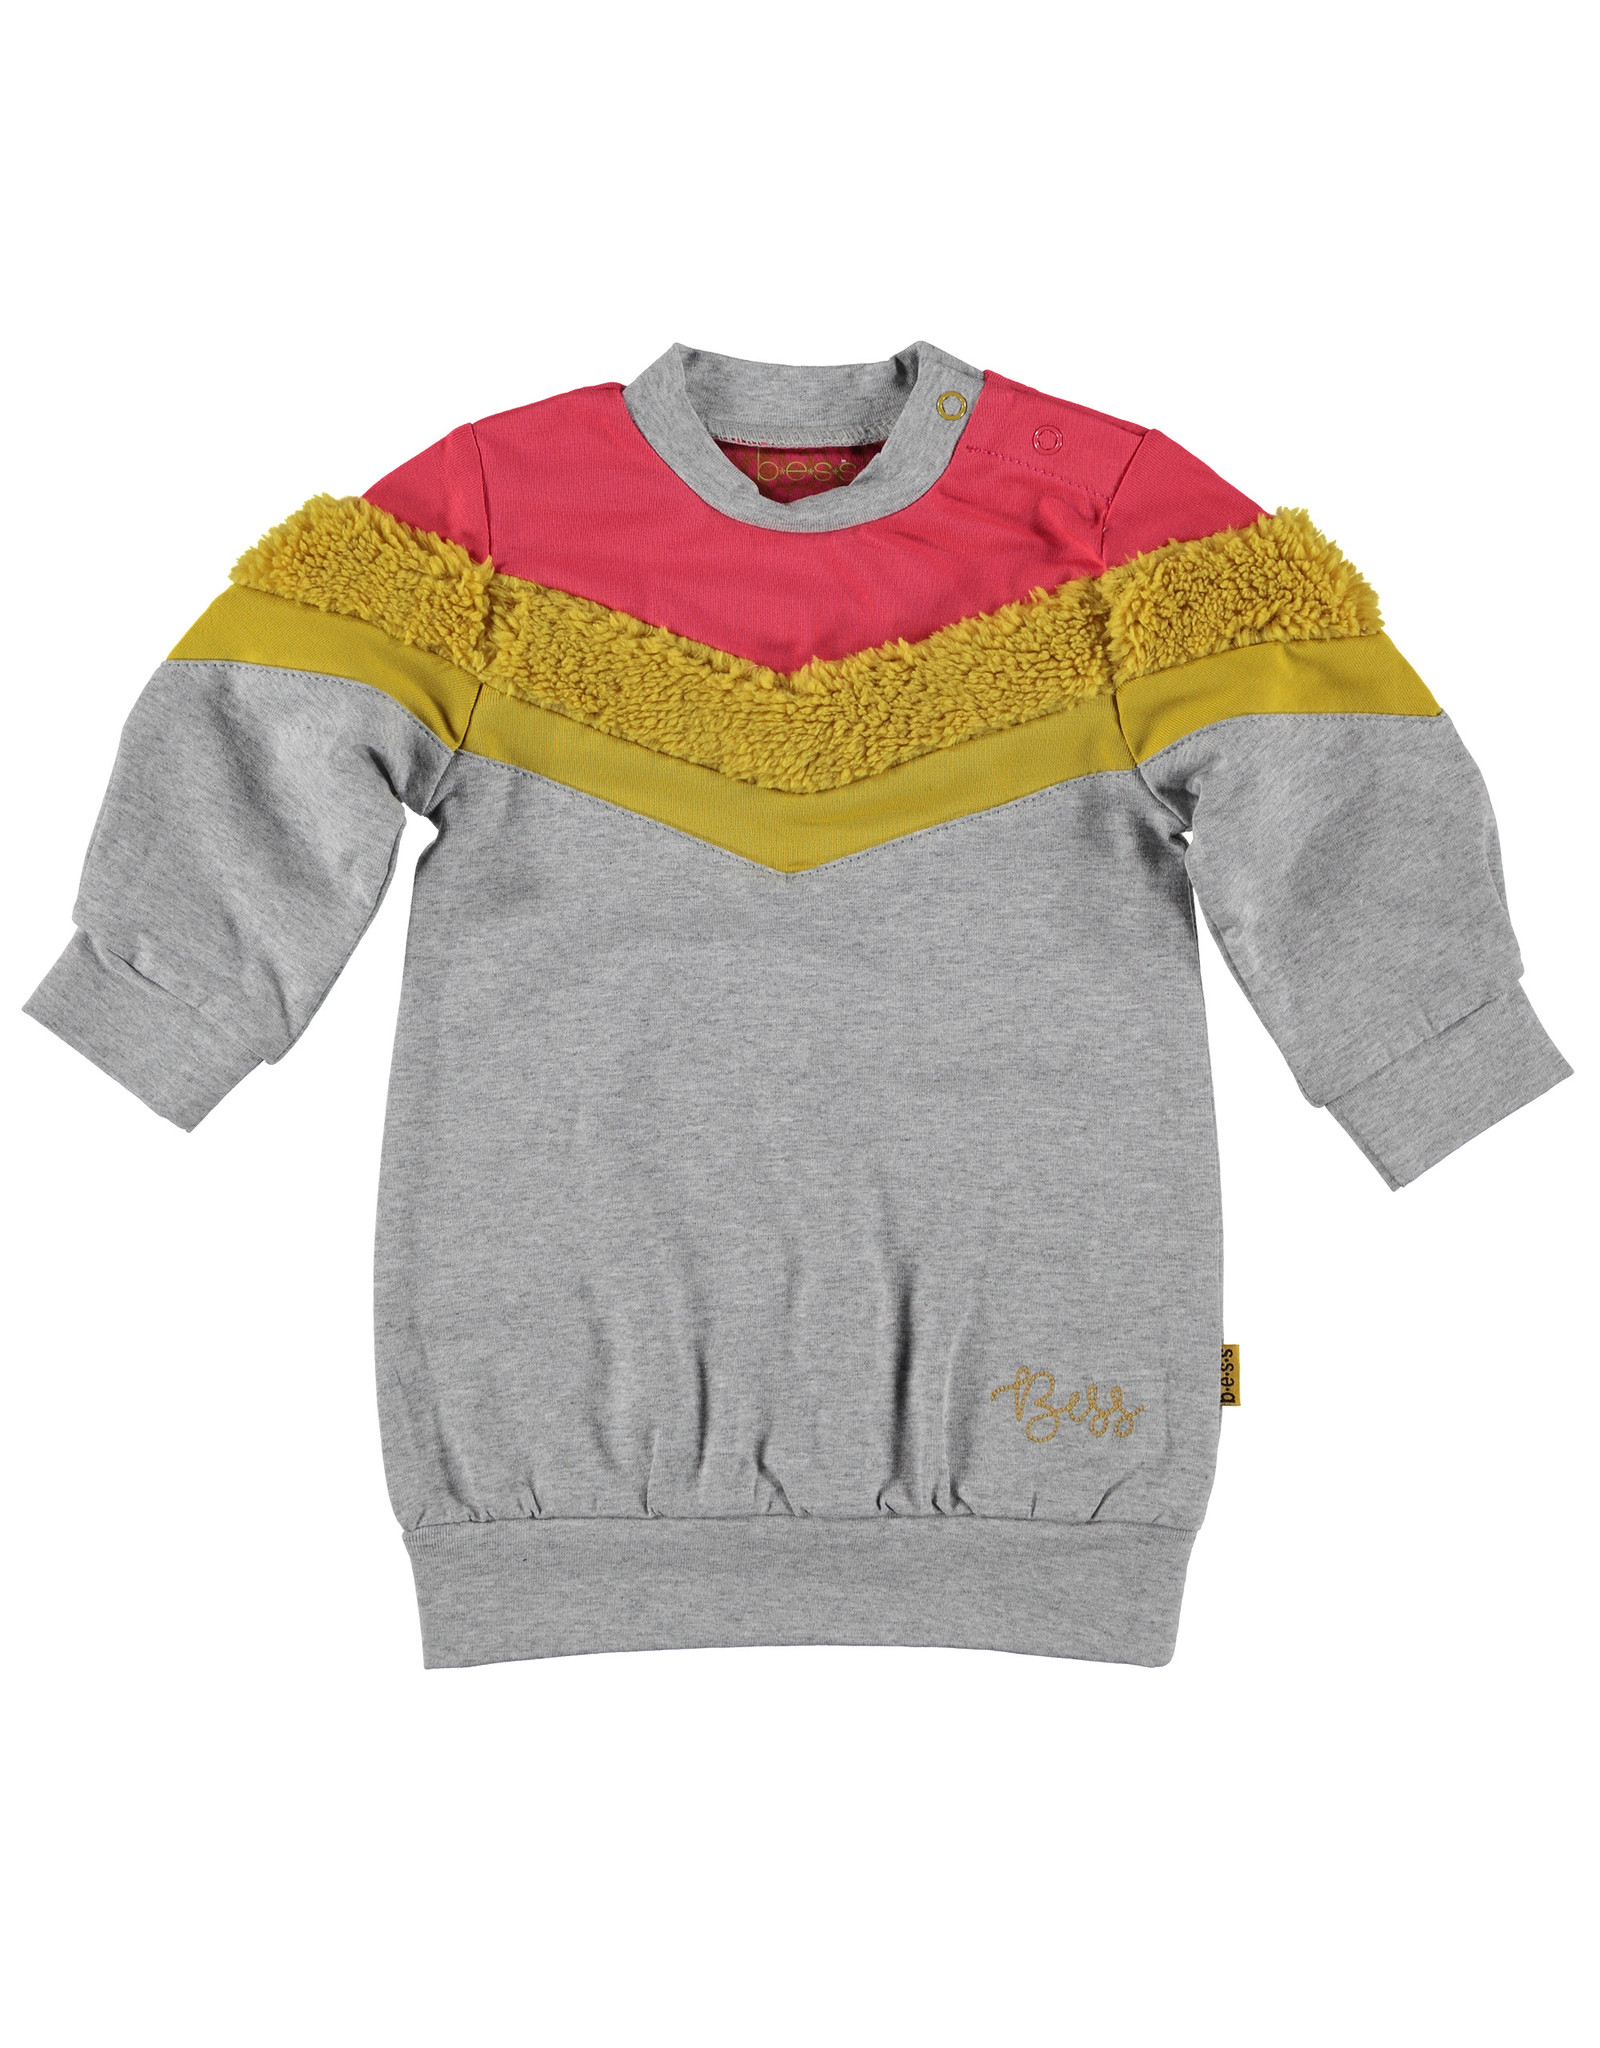 B.E.S.S. Sweatdress Colorblock, Grey